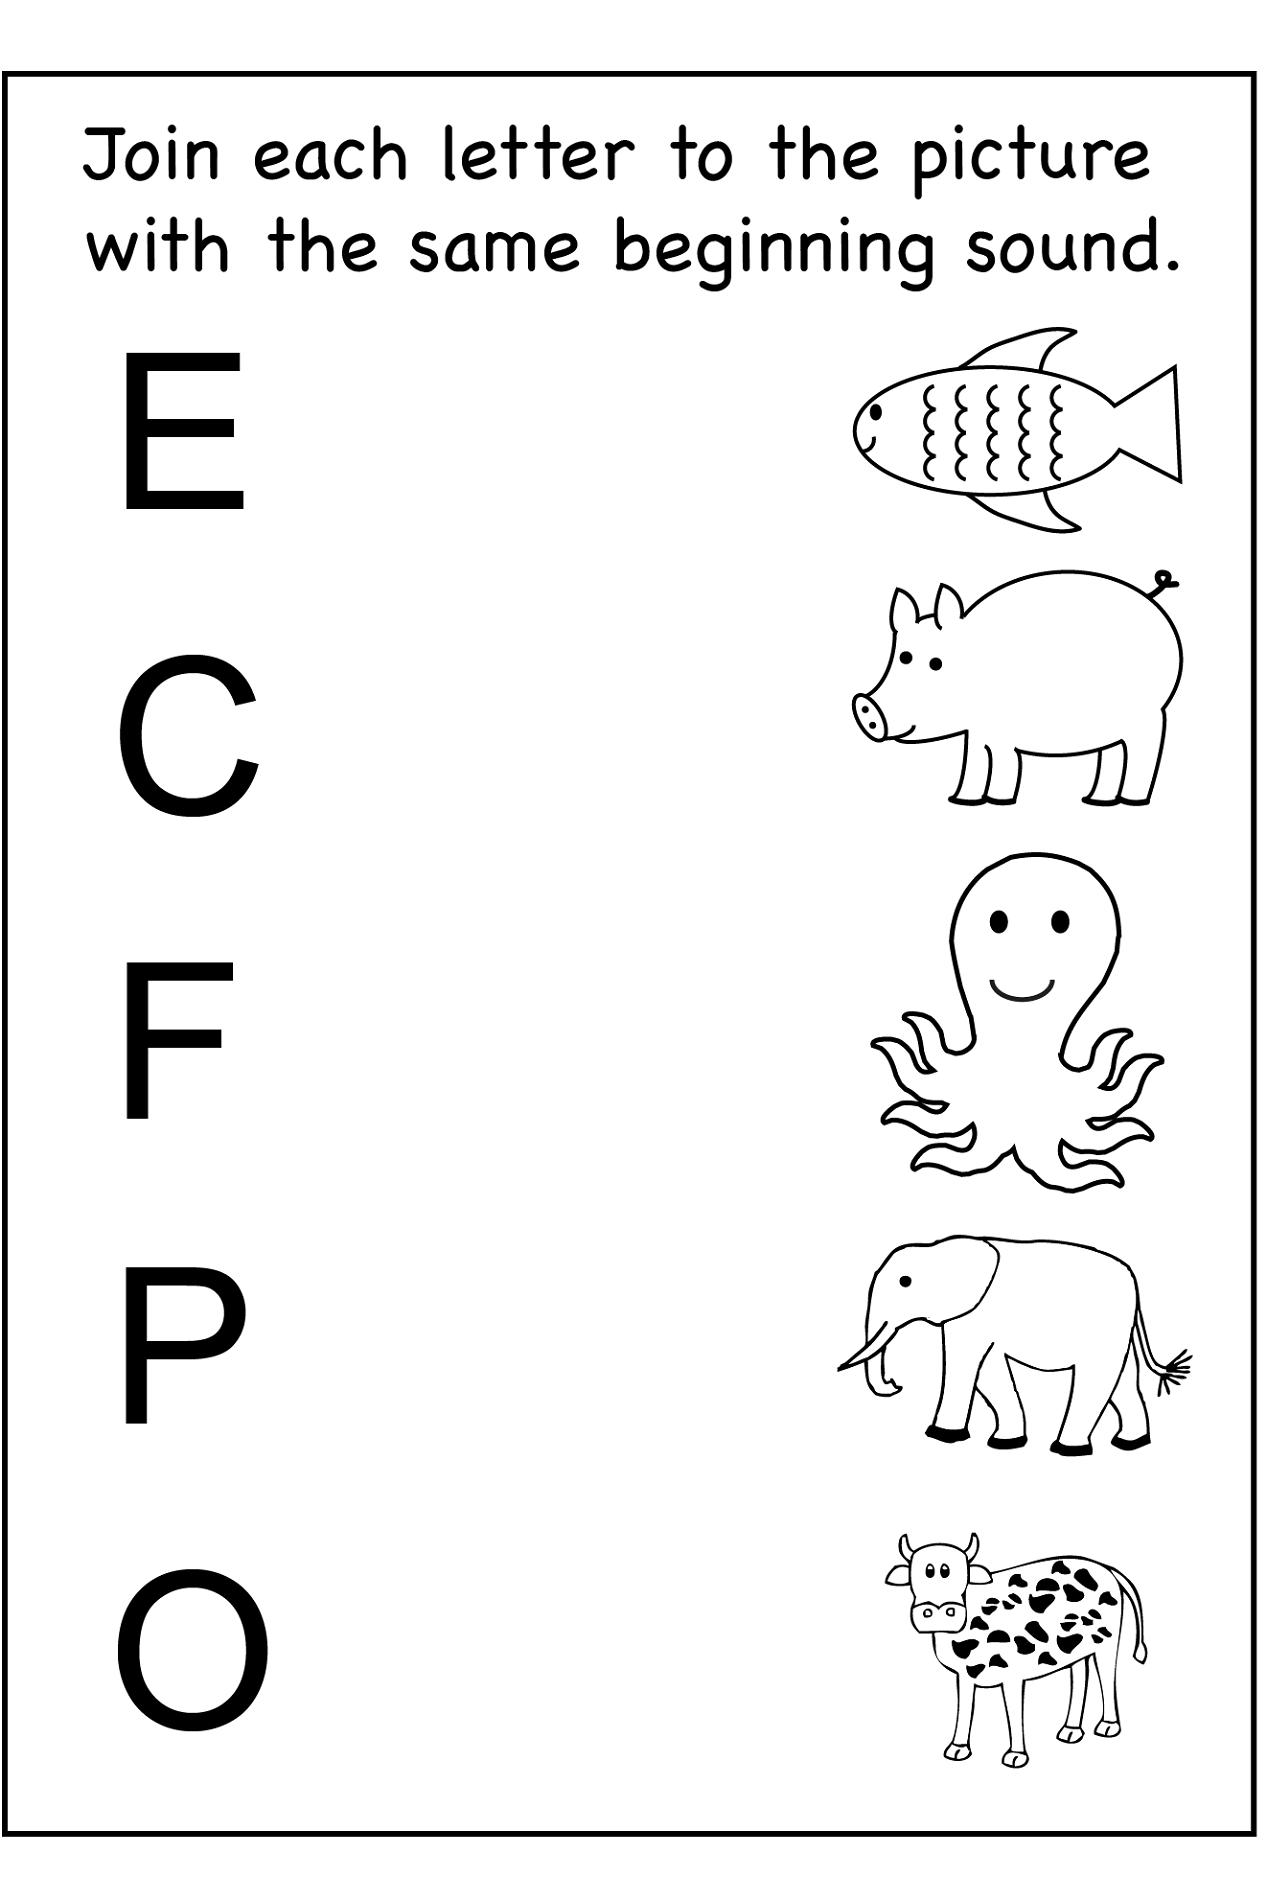 Worksheet For Kids Preschool Worksheet Activities